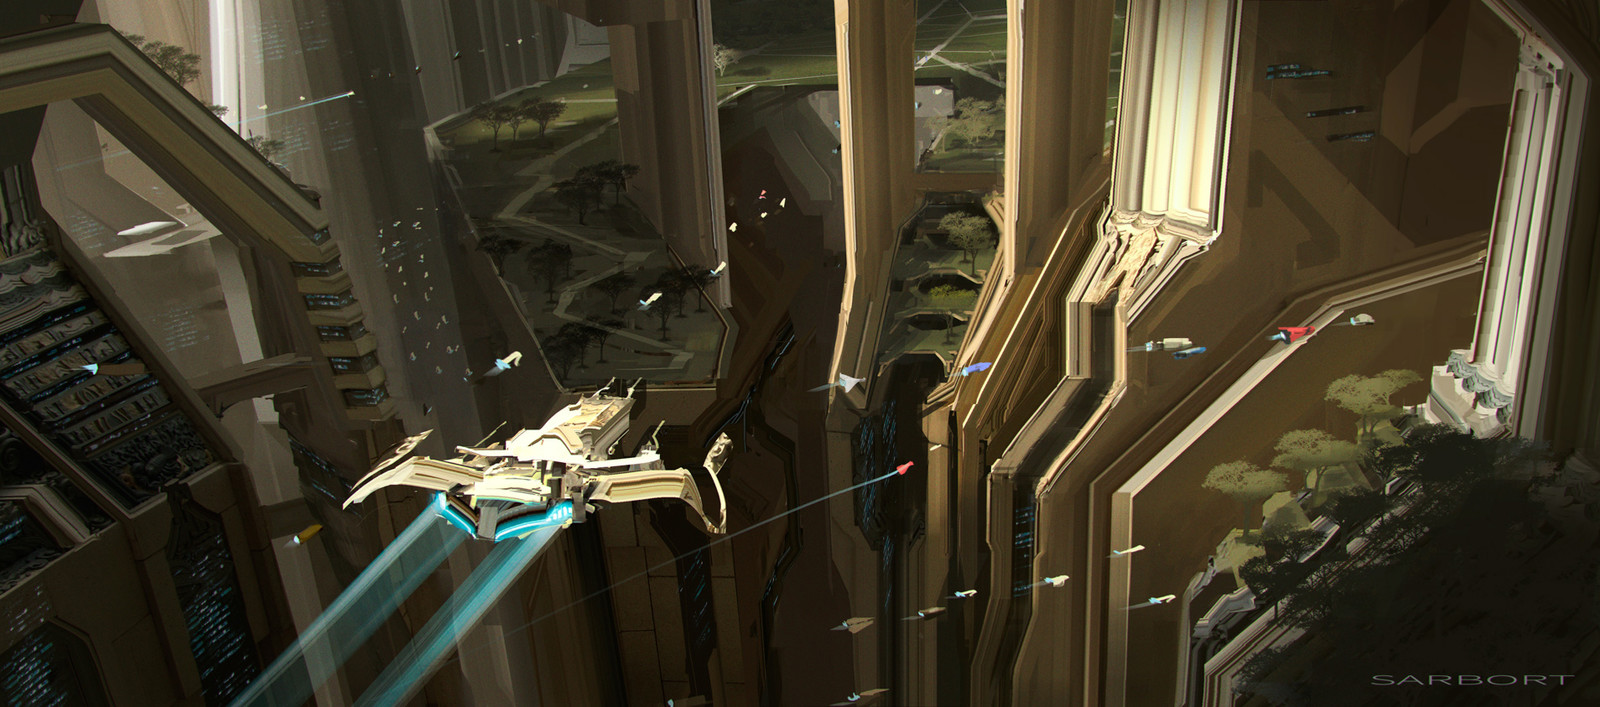 Sci-fi architecture sketch